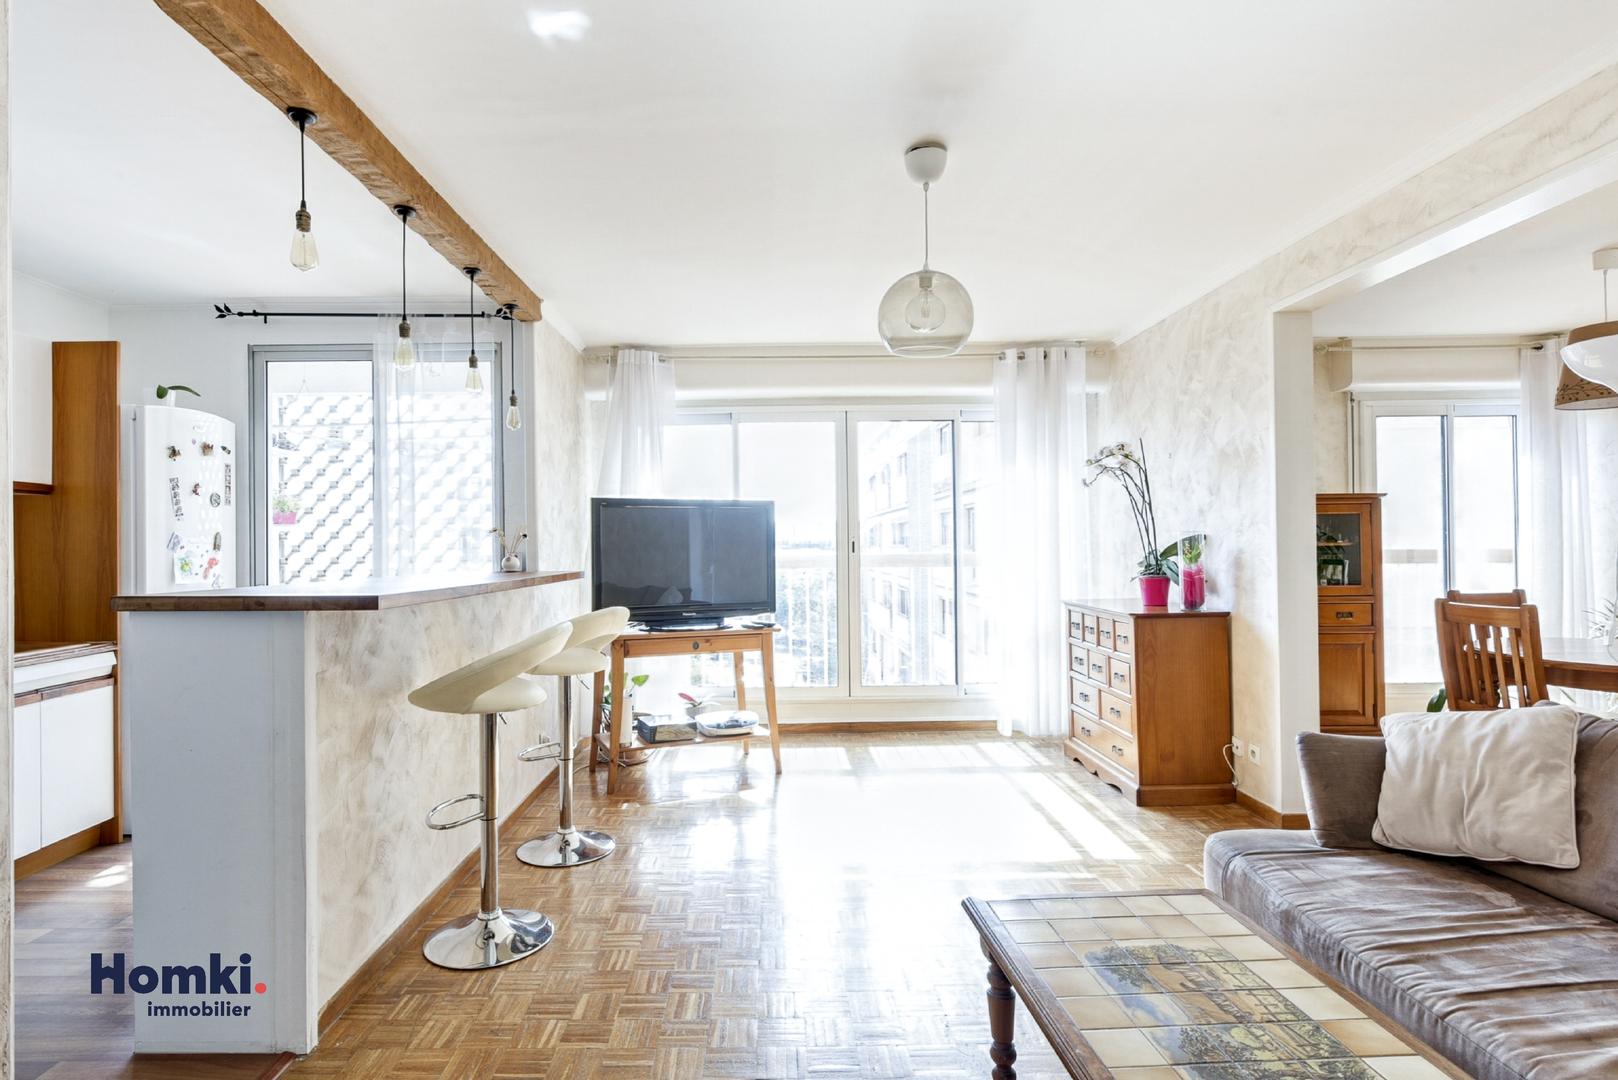 Vente appartement MArseille 13010 T5_2